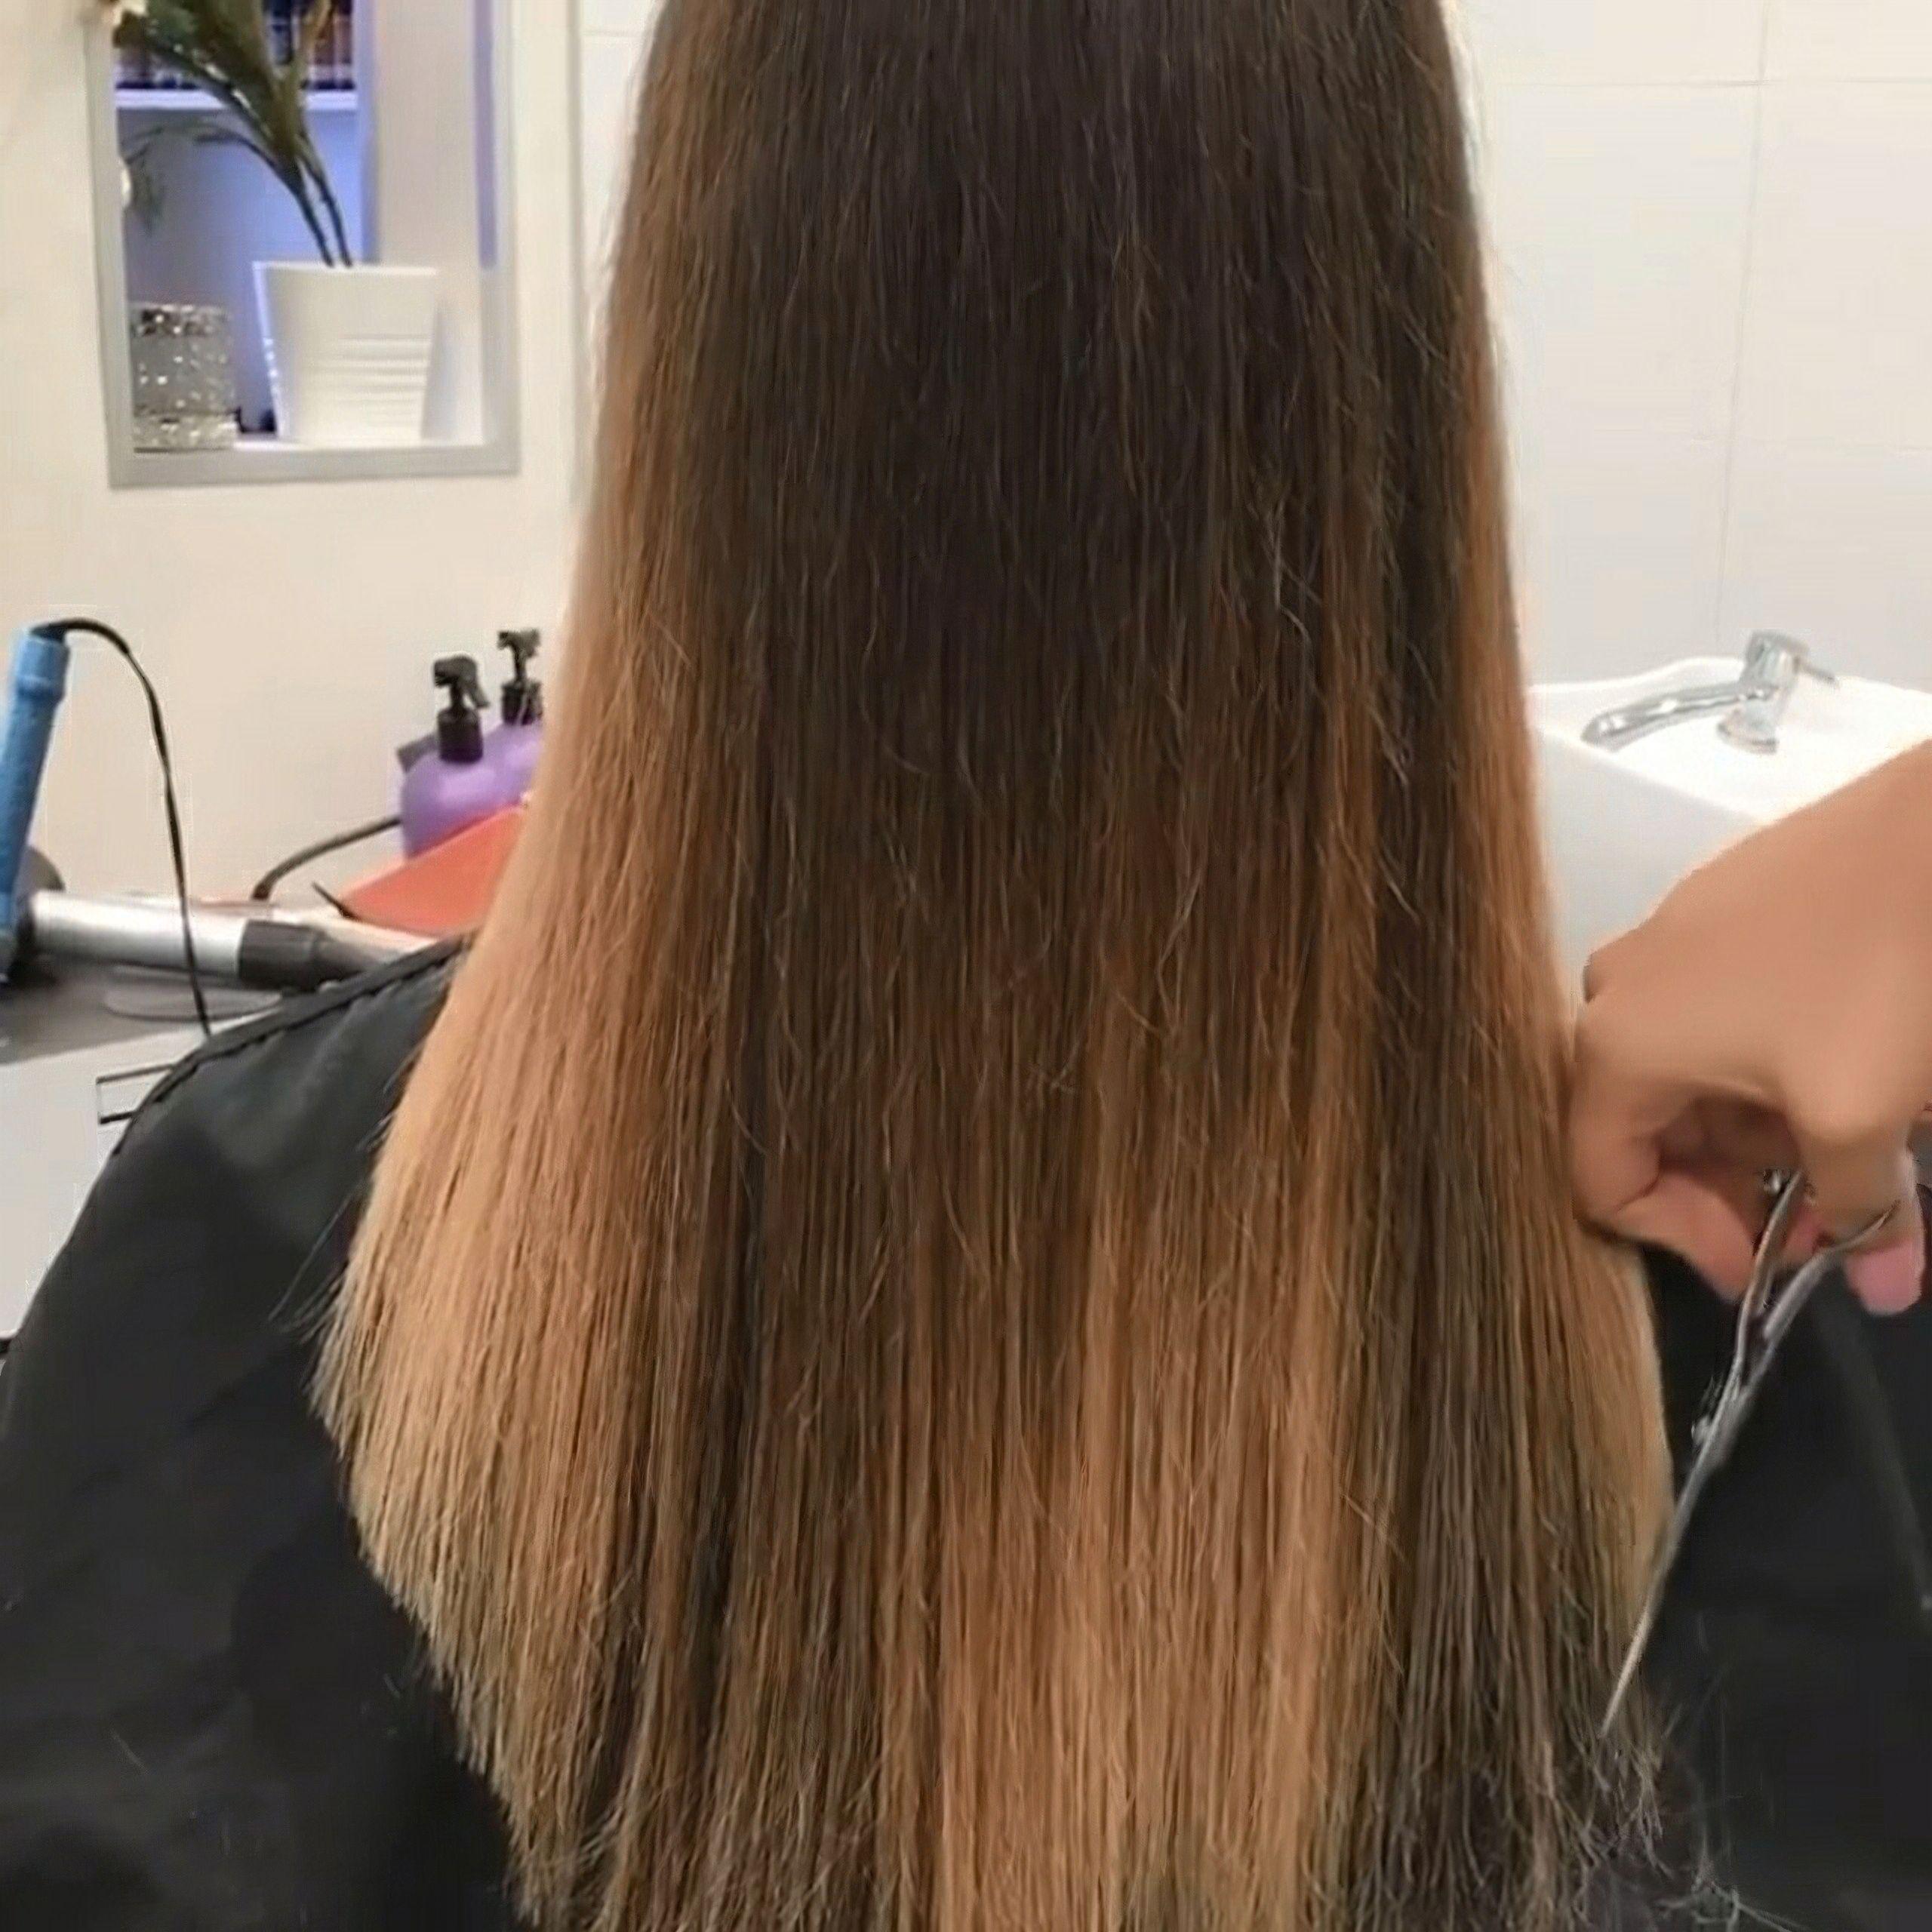 Amazon.com: hair color - Today's Deals / Hair Colo